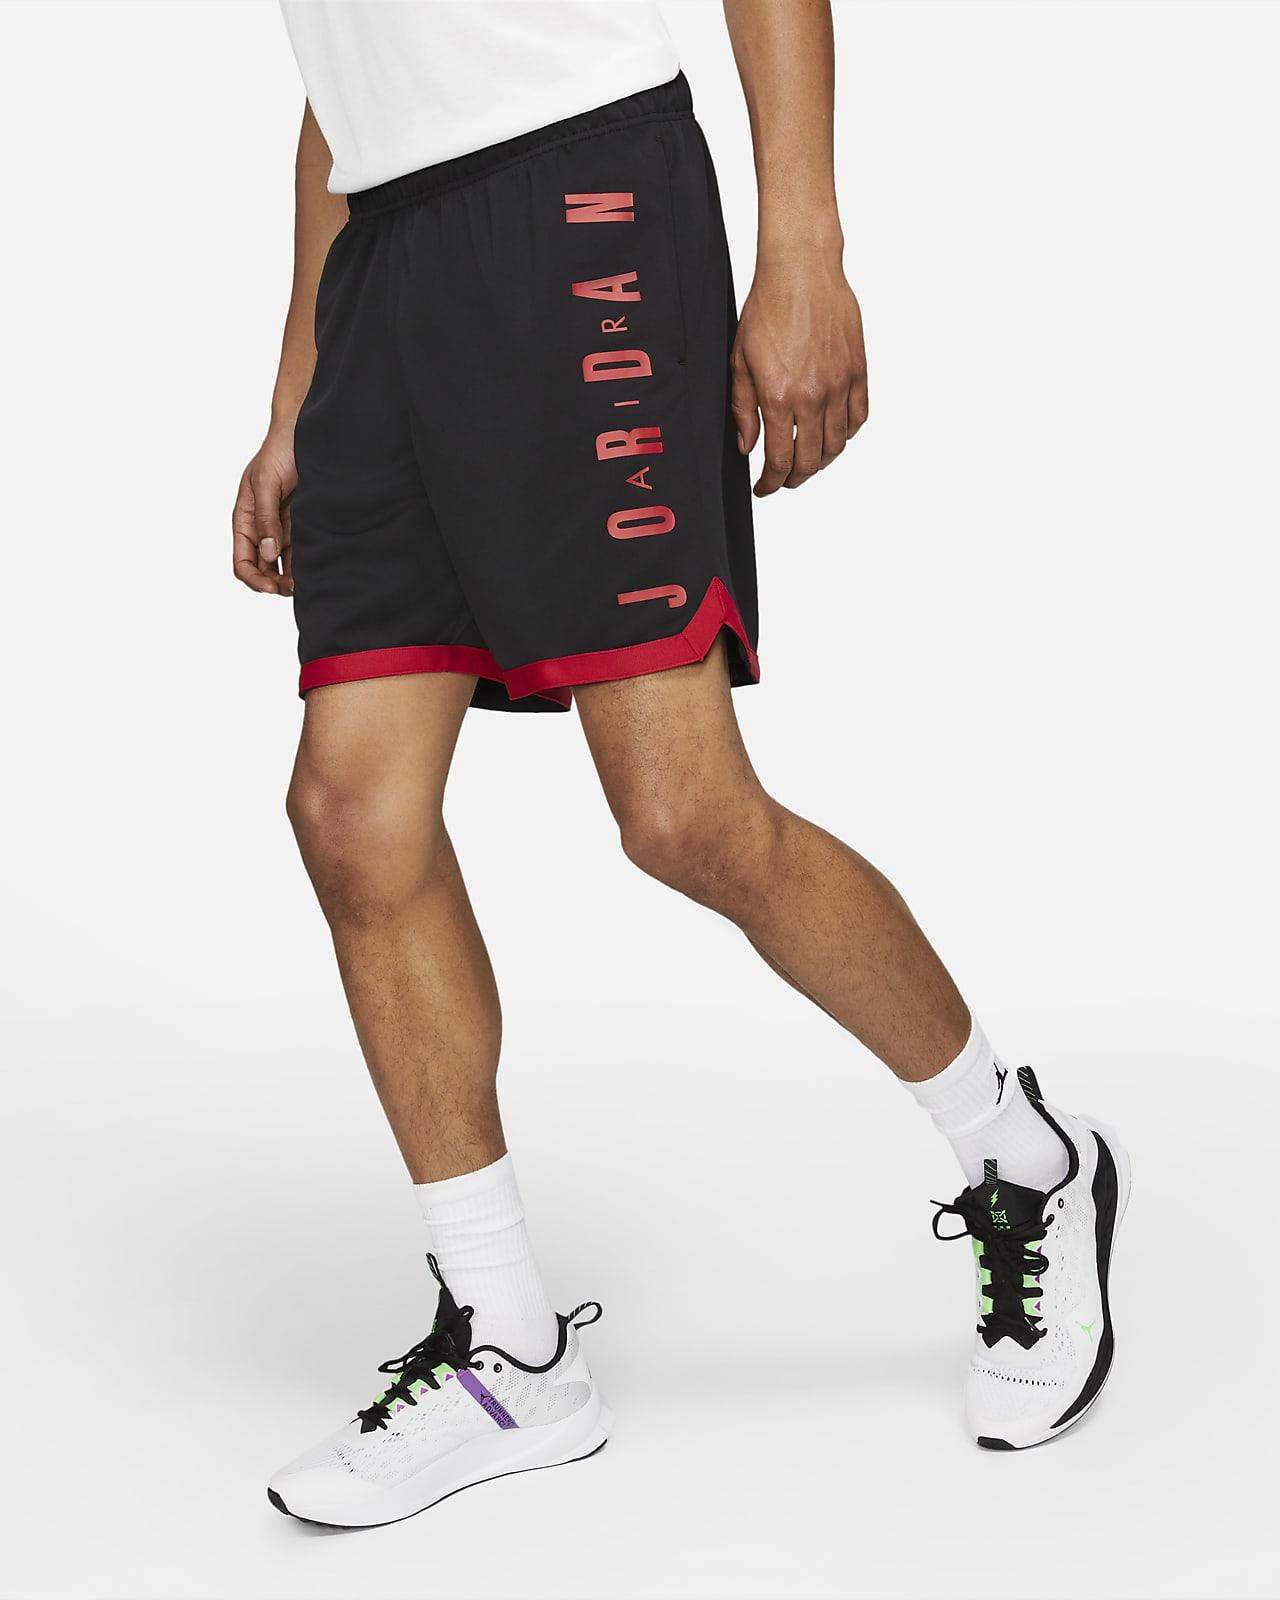 Jordan Jumpman Men's Graphic Knit Shorts